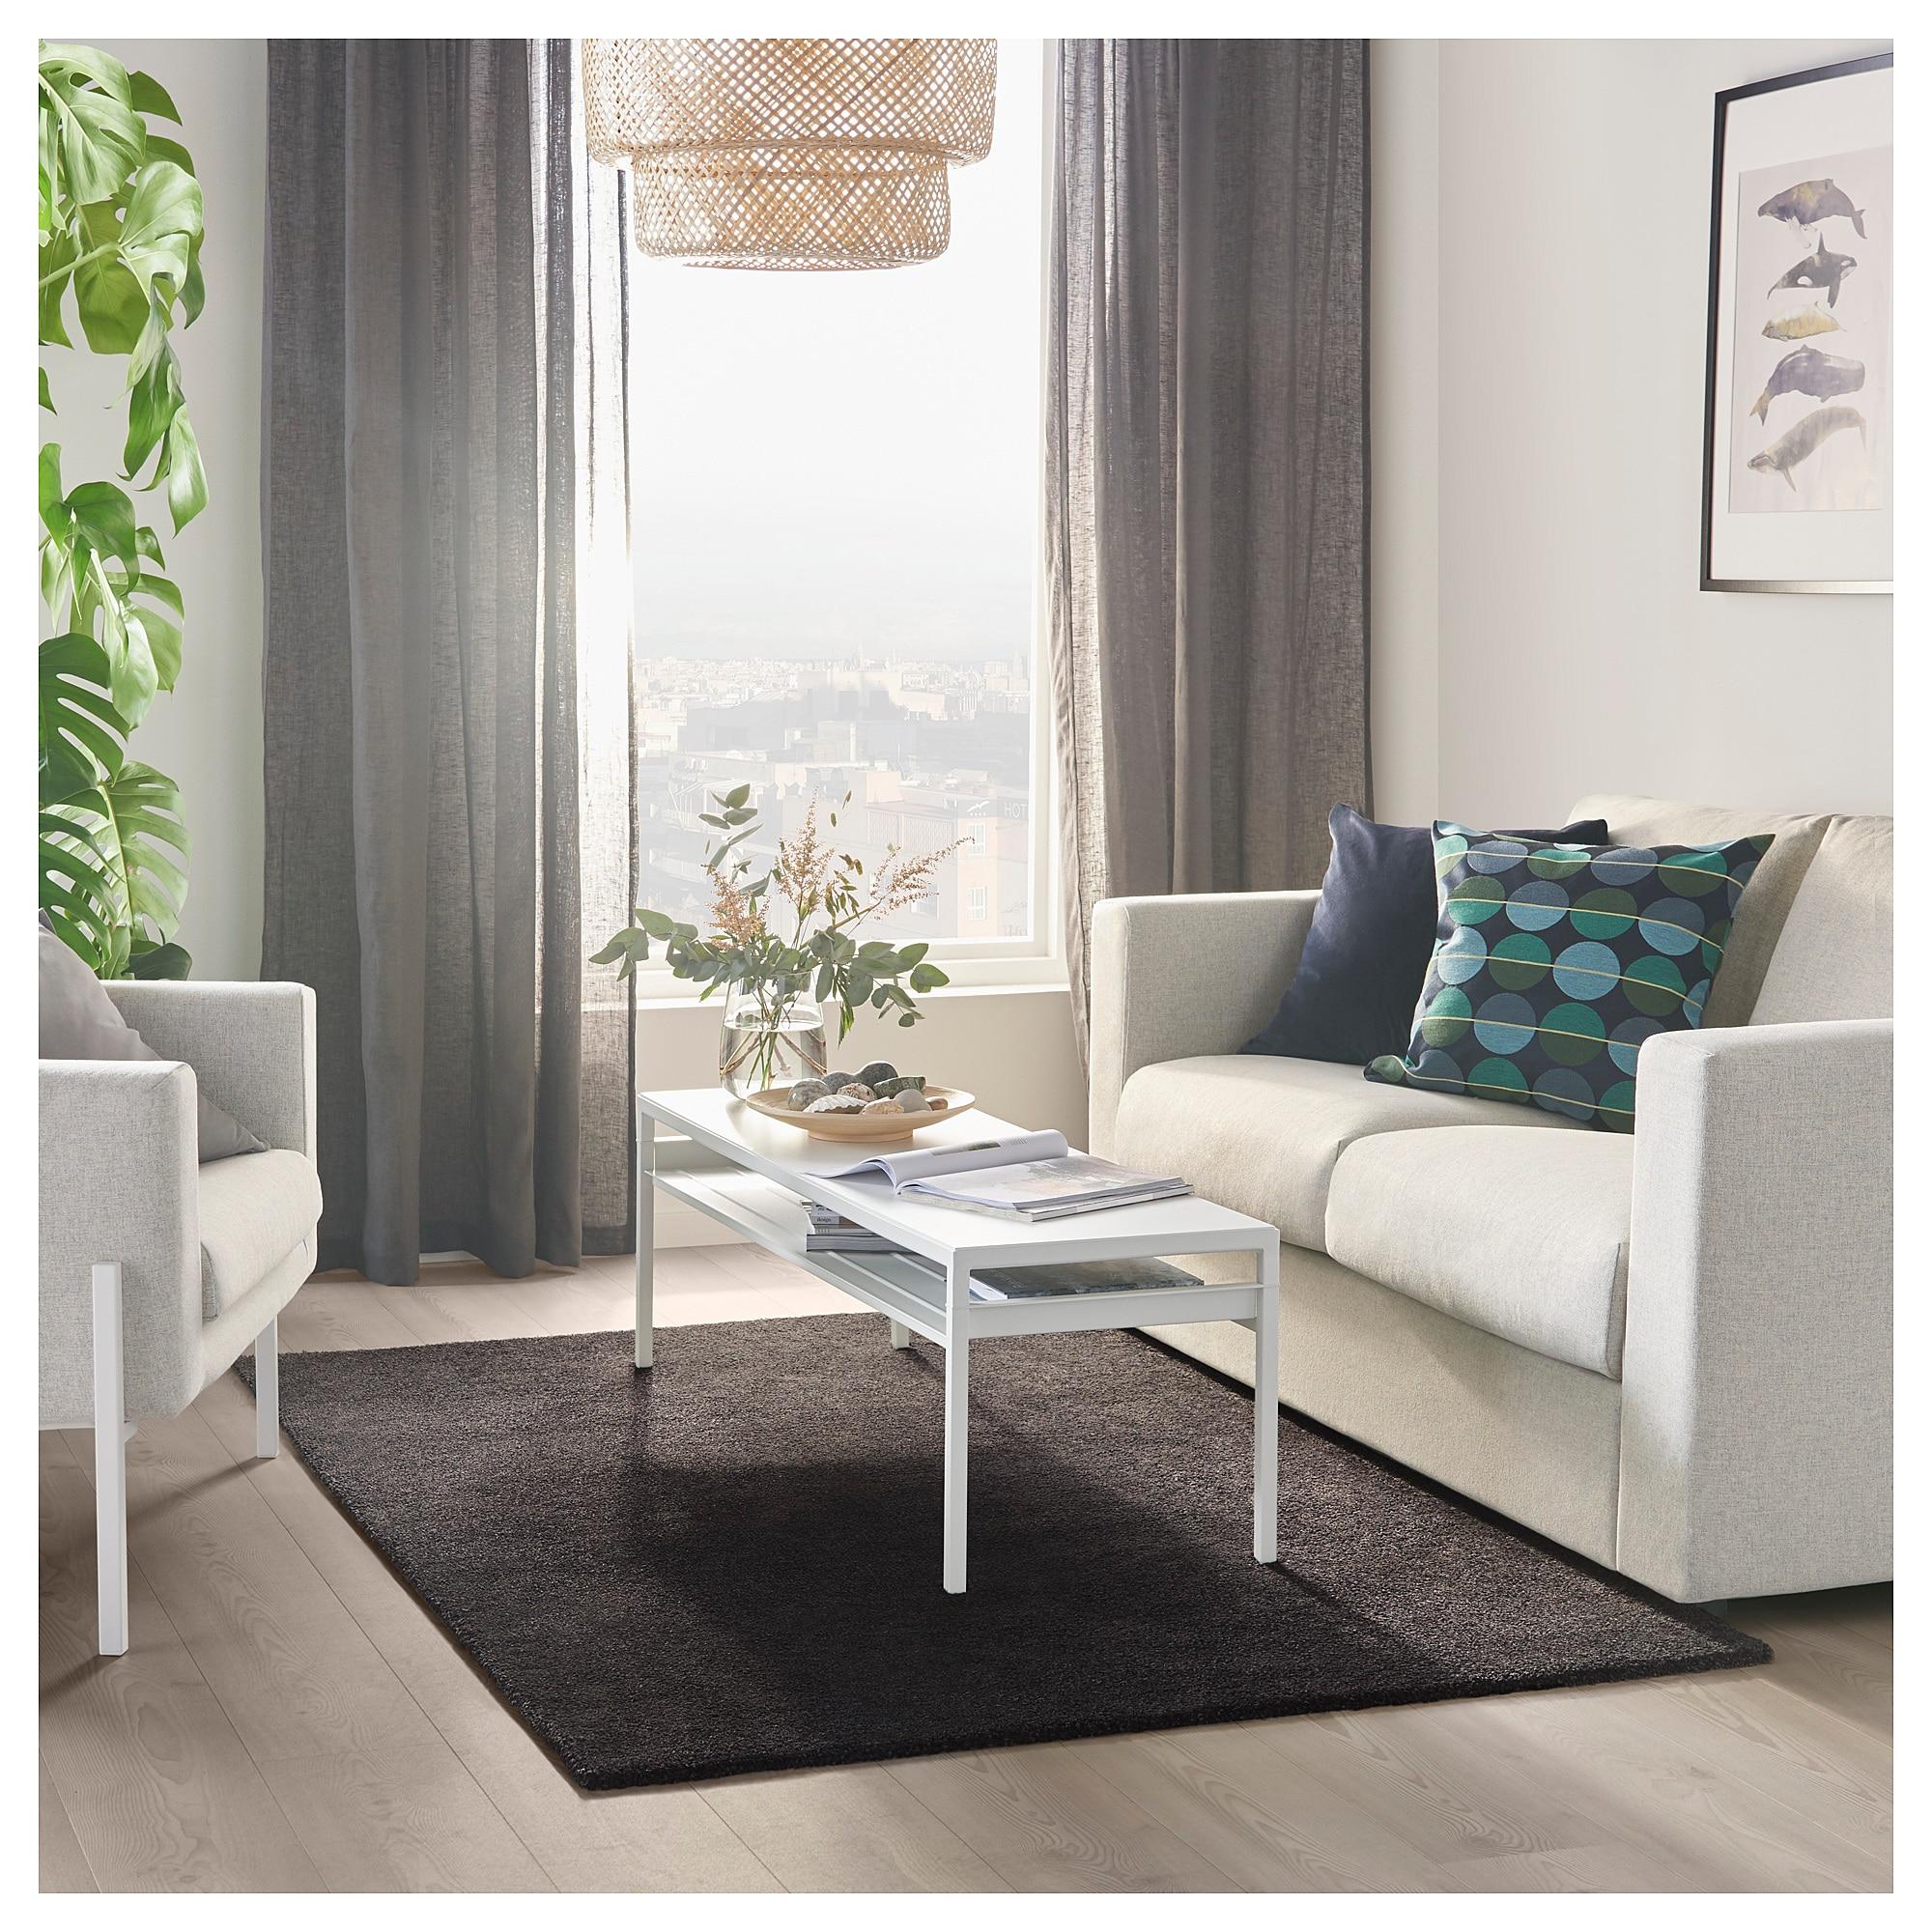 IKEA STOENSE Rug, low pile dark gray Living room grey